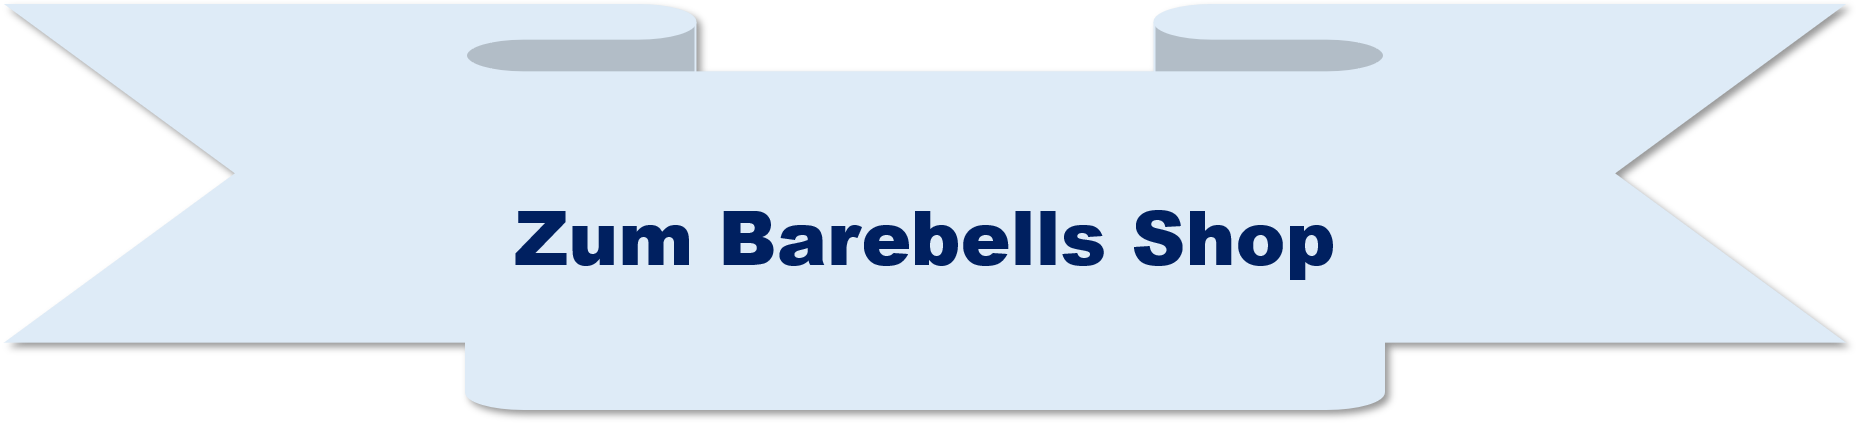 Barebells Shop